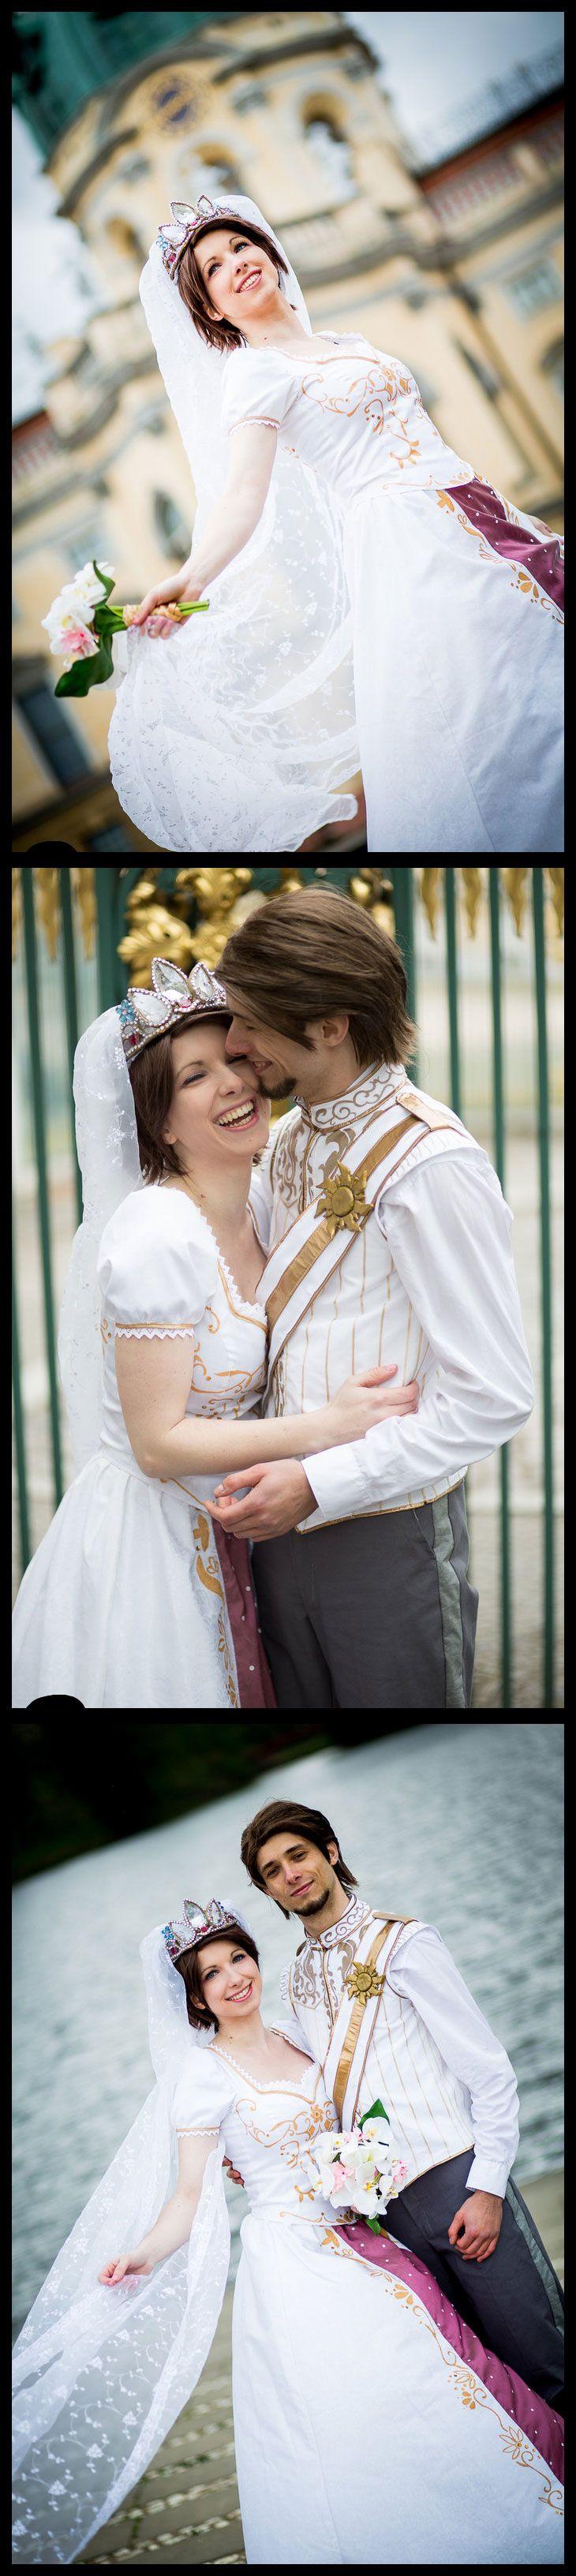 Location: Charlottenburg Castle, Berlin Fandom: Tangled Ever After (Disney) http://rayi-kun.deviantart.com/art/Happily-Ever-After-369254042